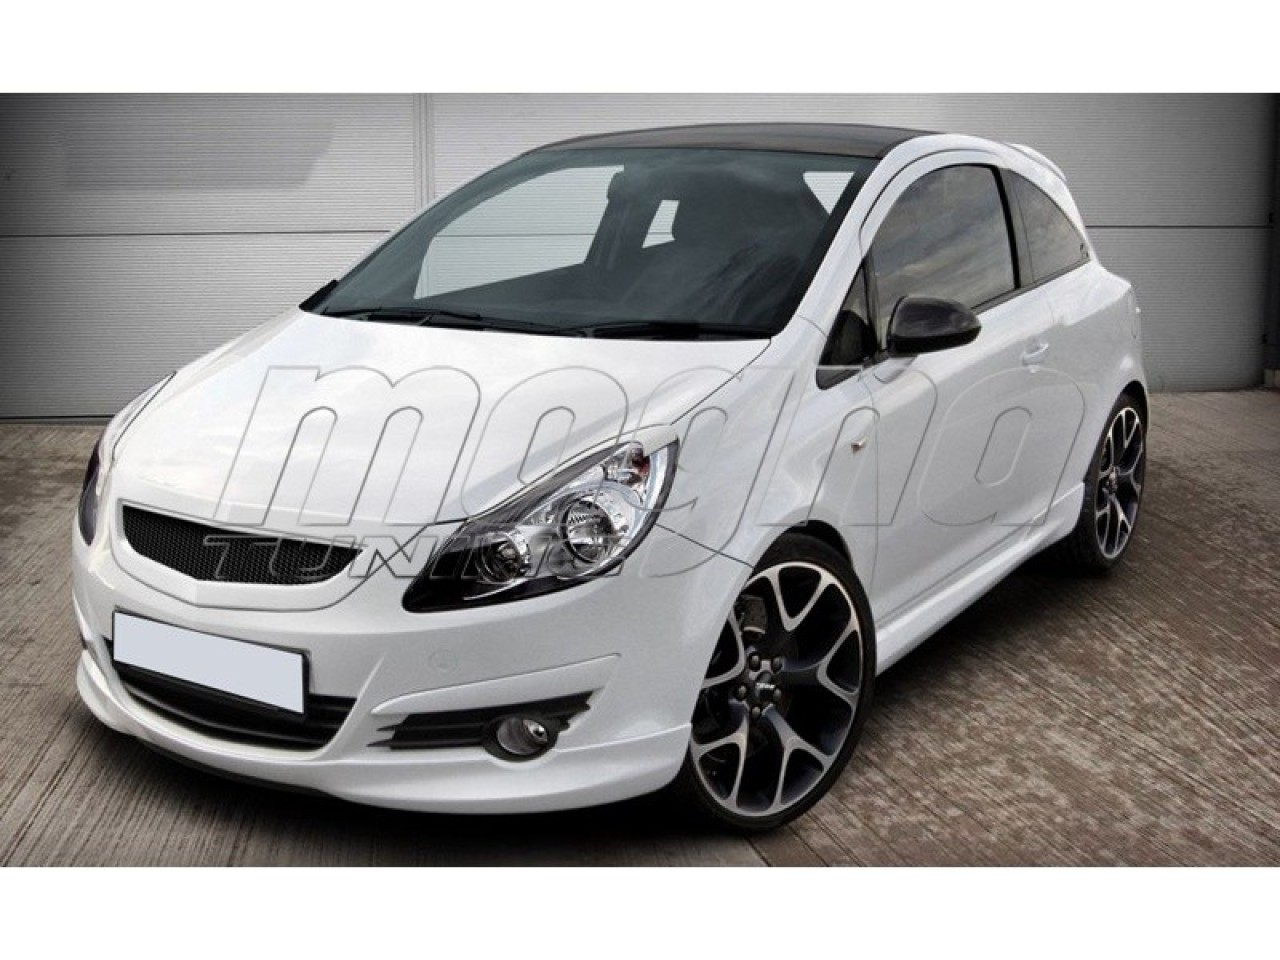 Opel Corsa D Body Kit